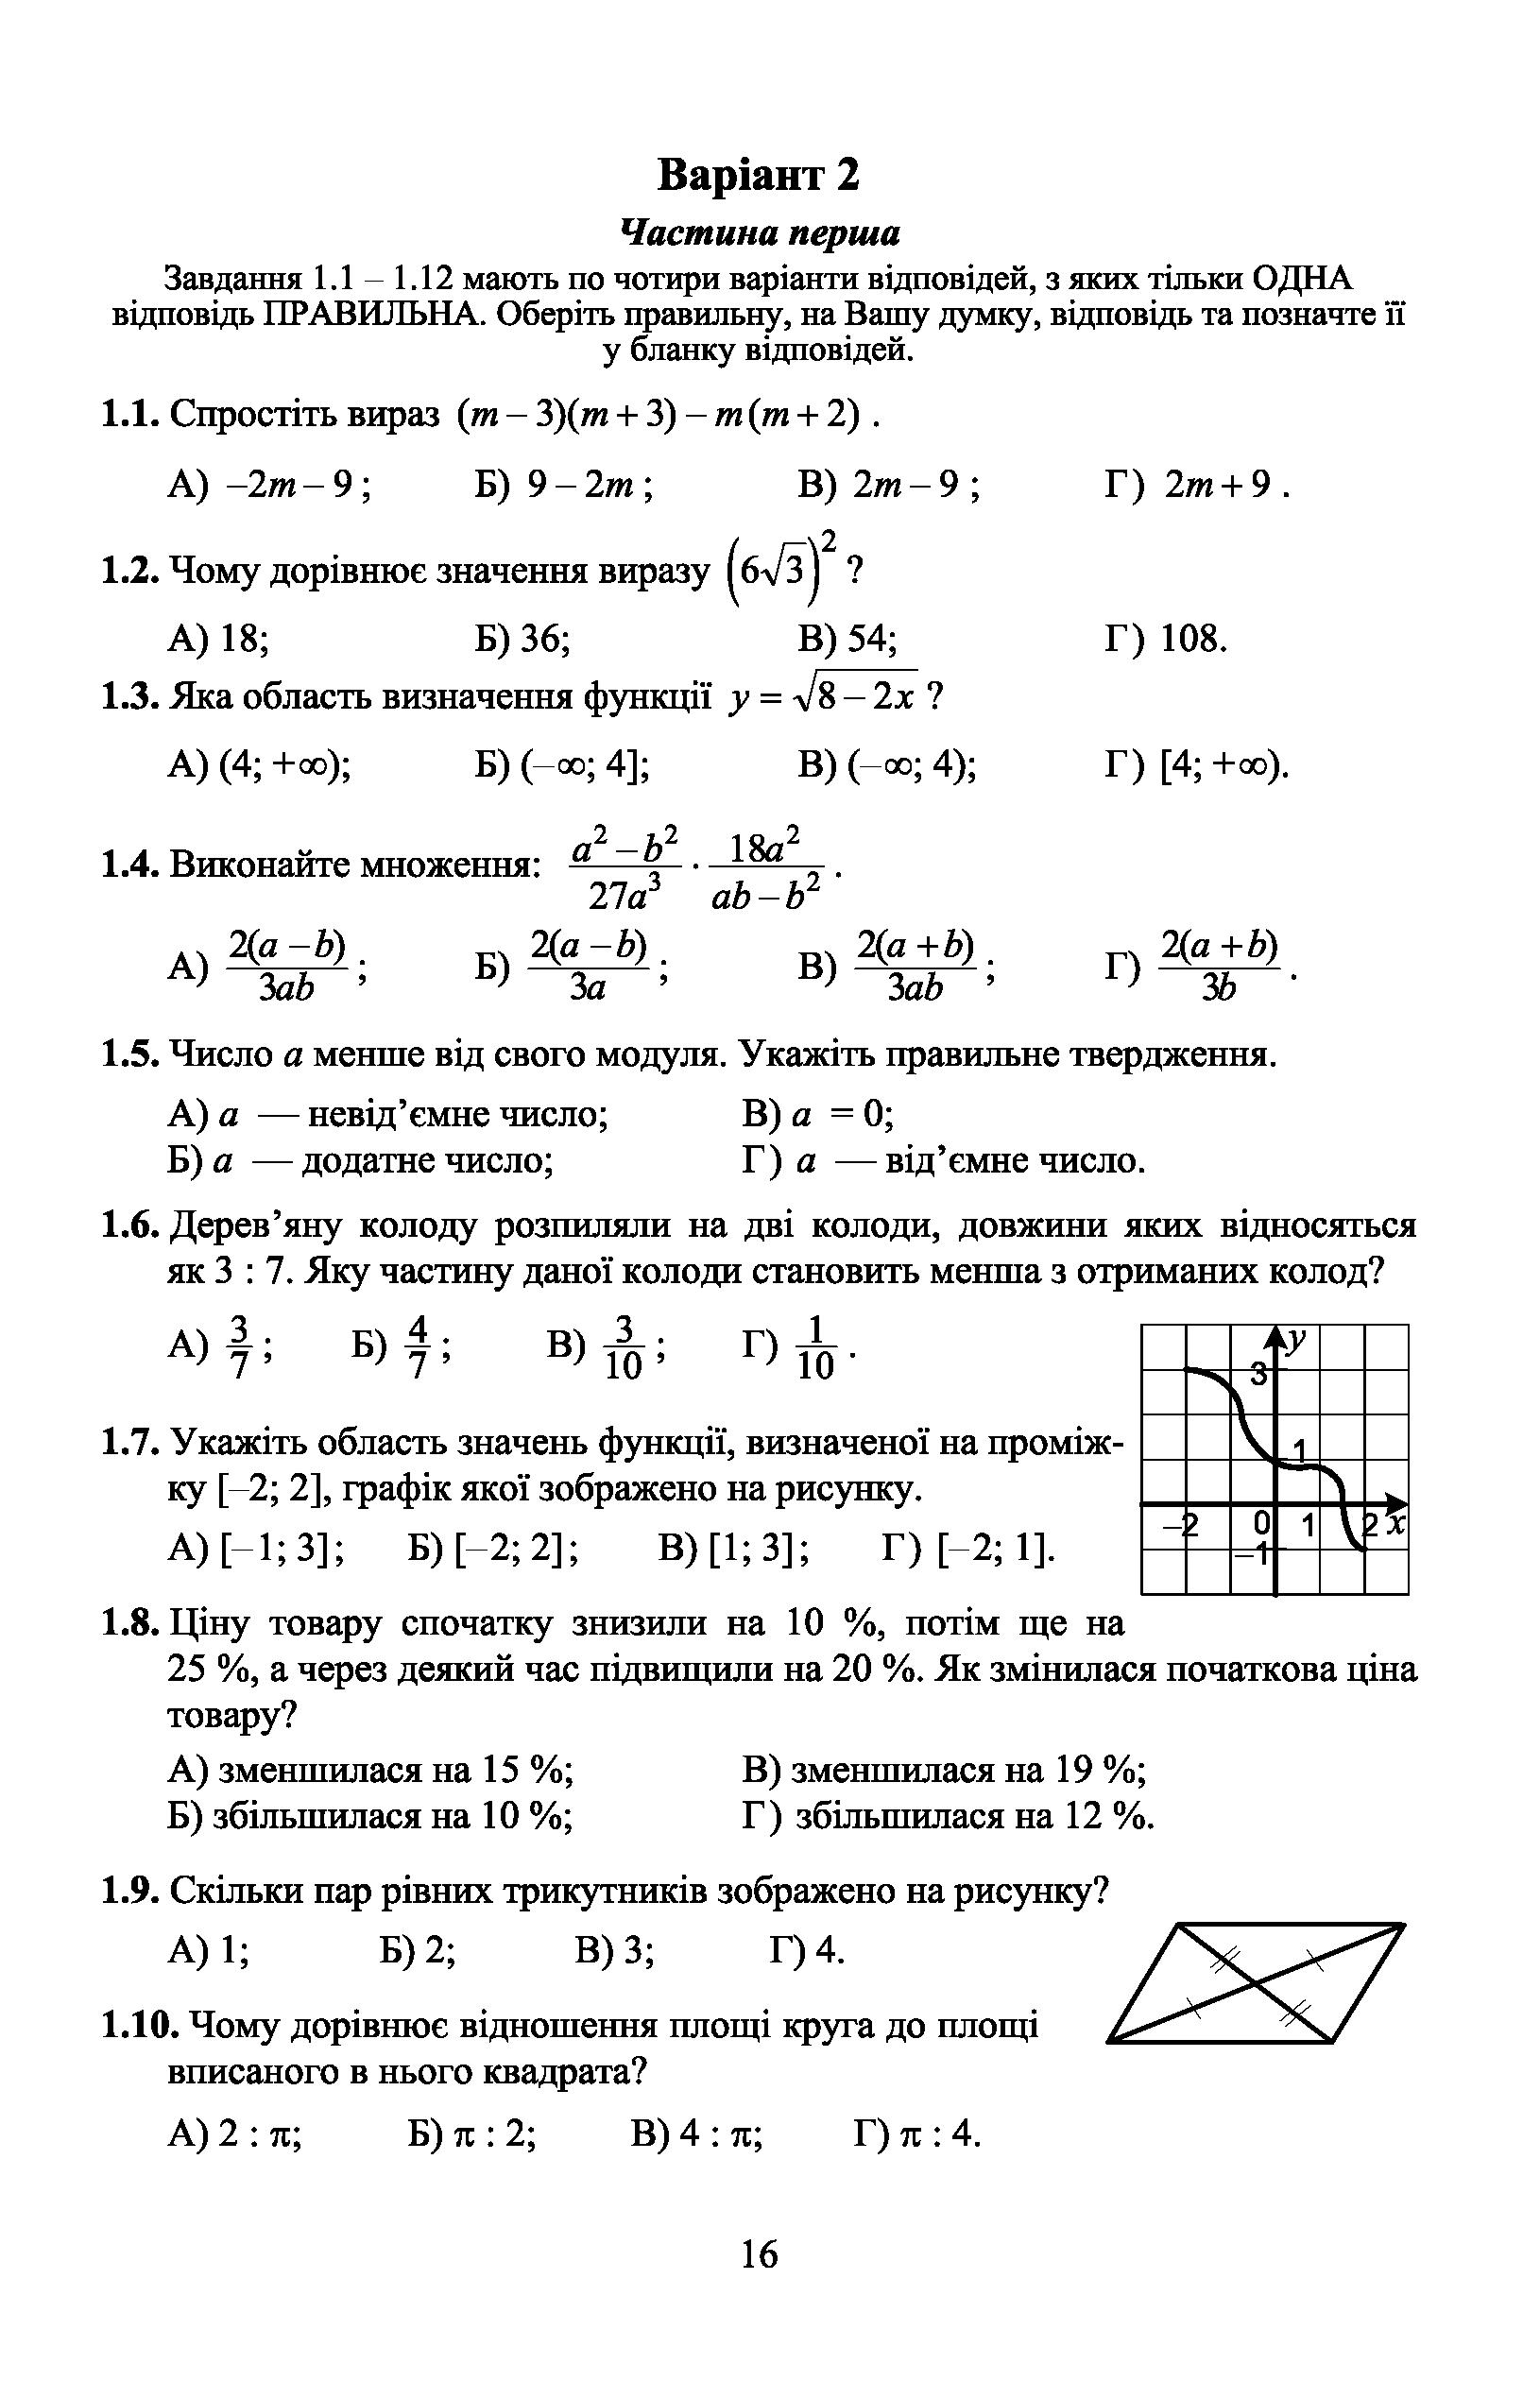 Дпа математика 2014 9 класс решебник